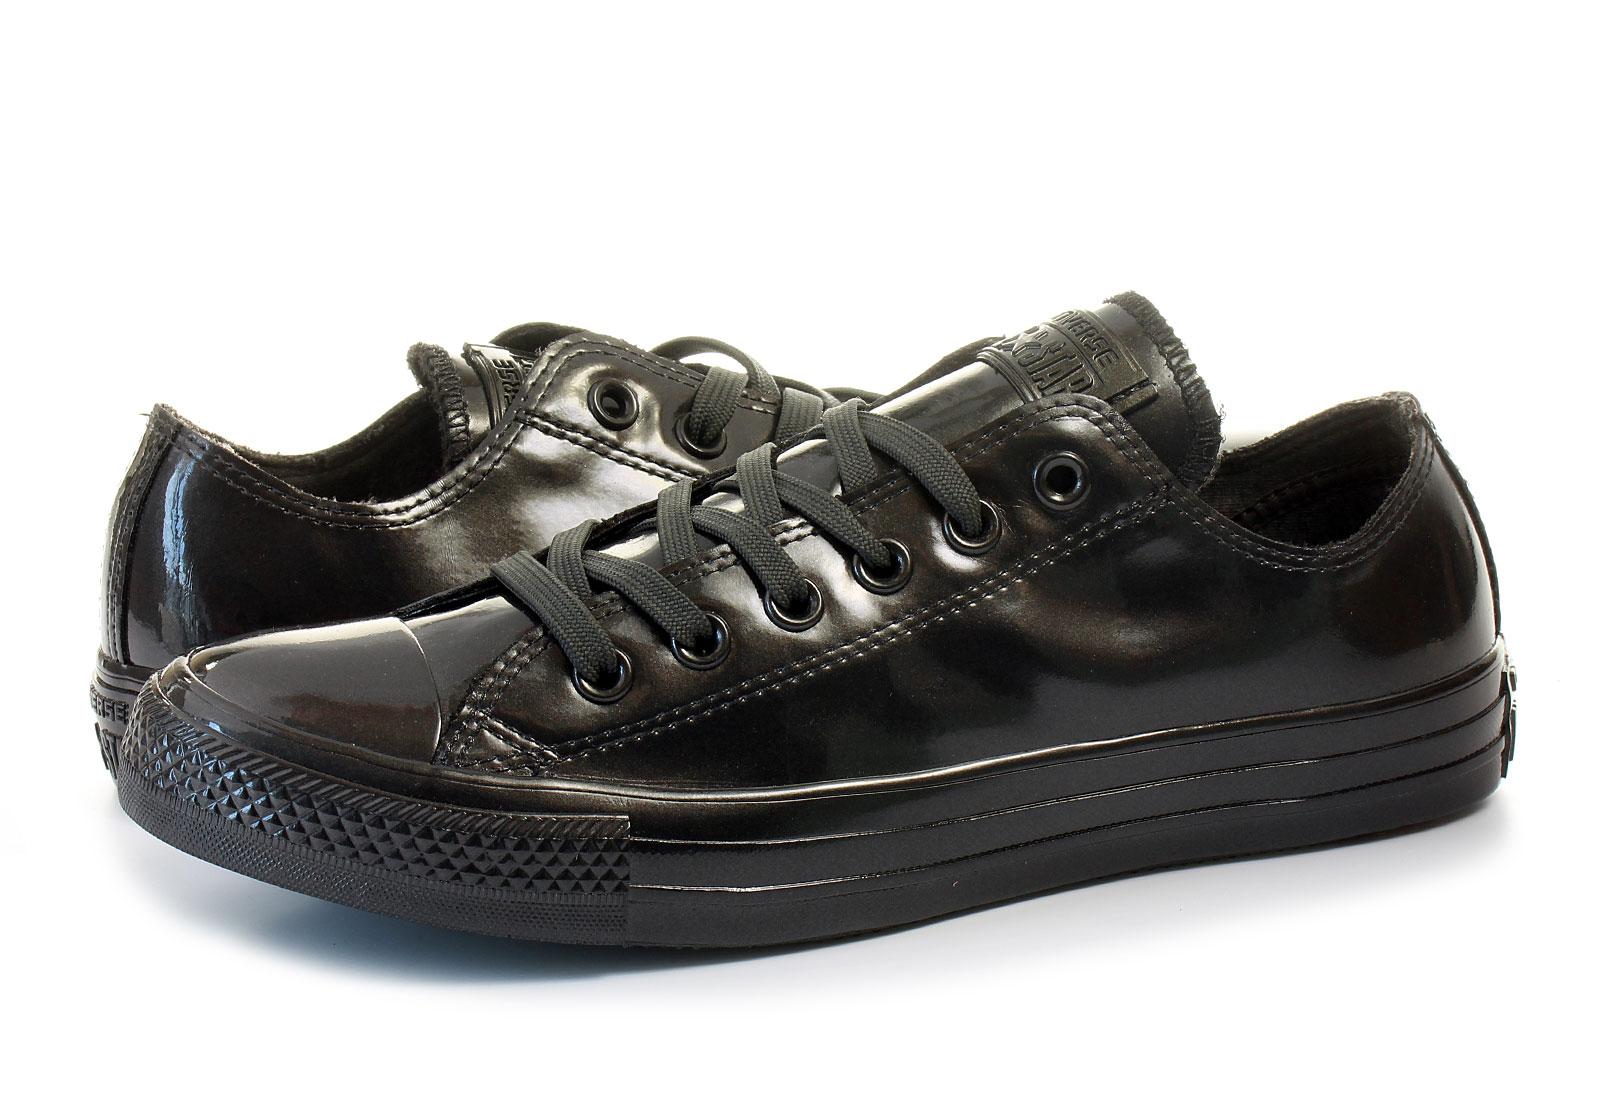 95651bf53494 Converse Niske Tenisice Crne Tenisice - Chuck Taylor All Star Metallic  Rubber - Office Shoes - Online trgovina obuće